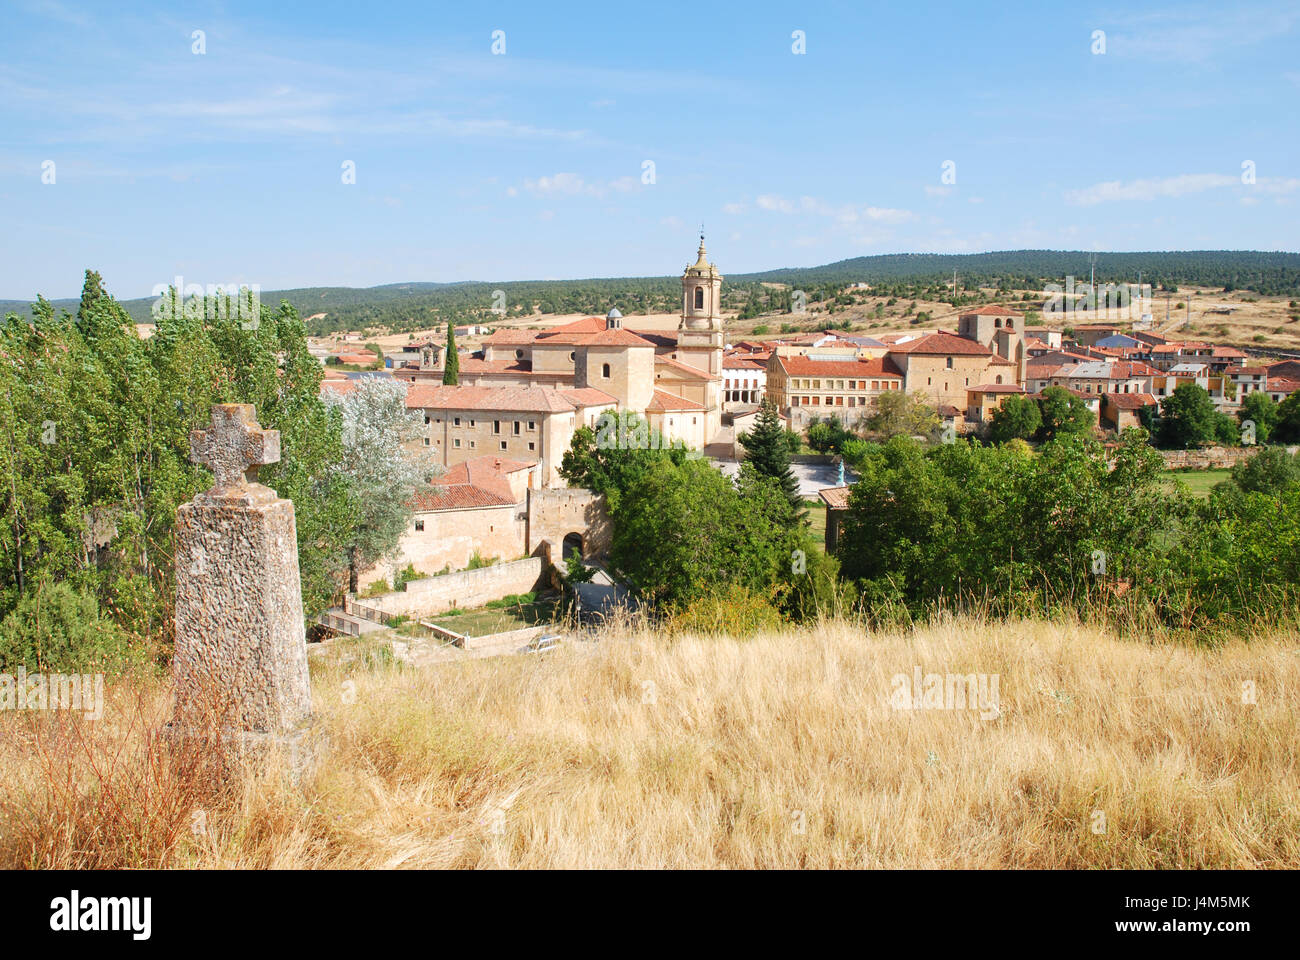 Overview. Santo Domingo de Silos, Burgos province, Castilla Leon, Spain. - Stock Image